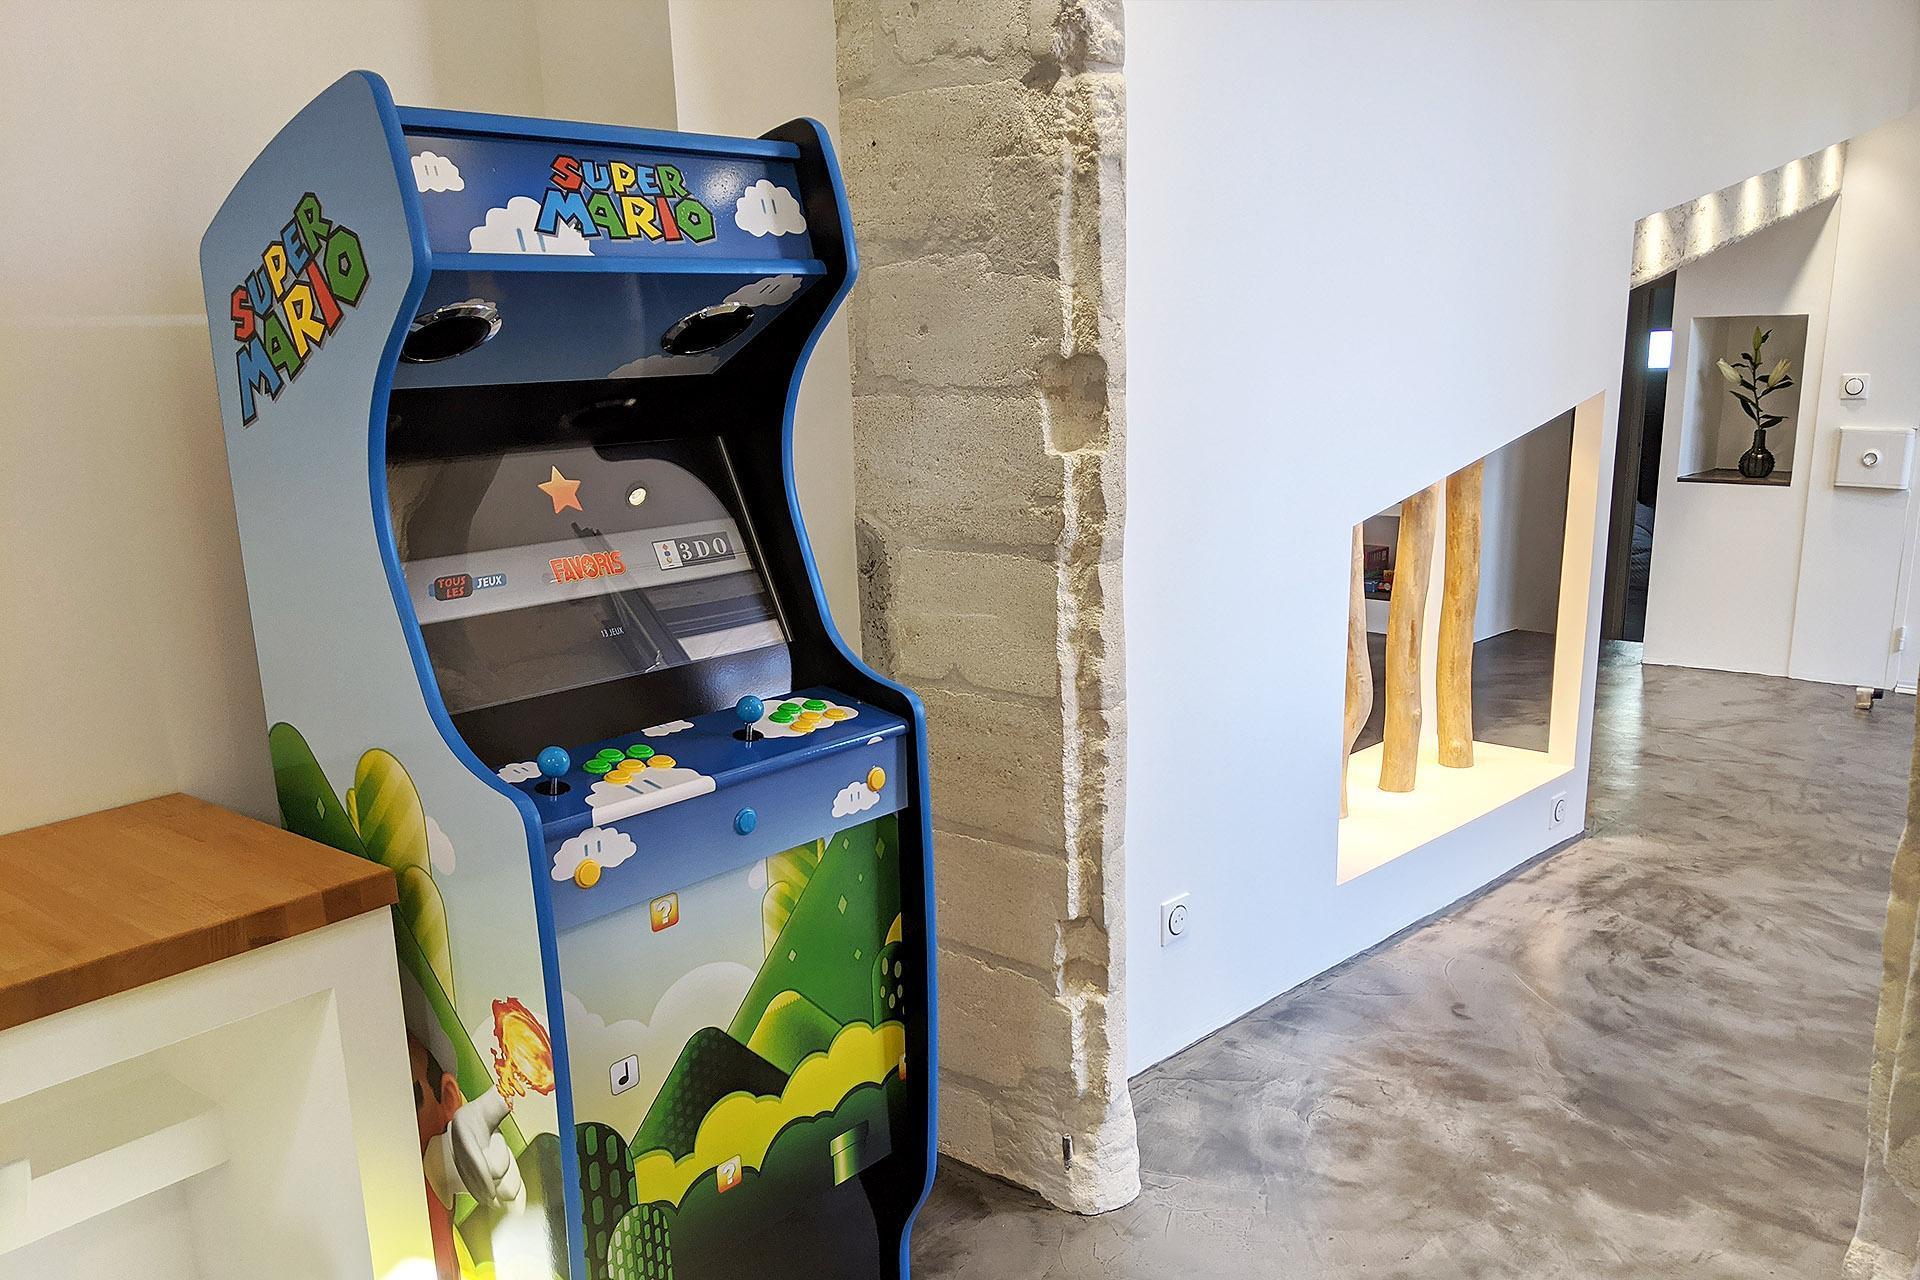 L'Origami, Avignon Intramuros, Box d'arcade